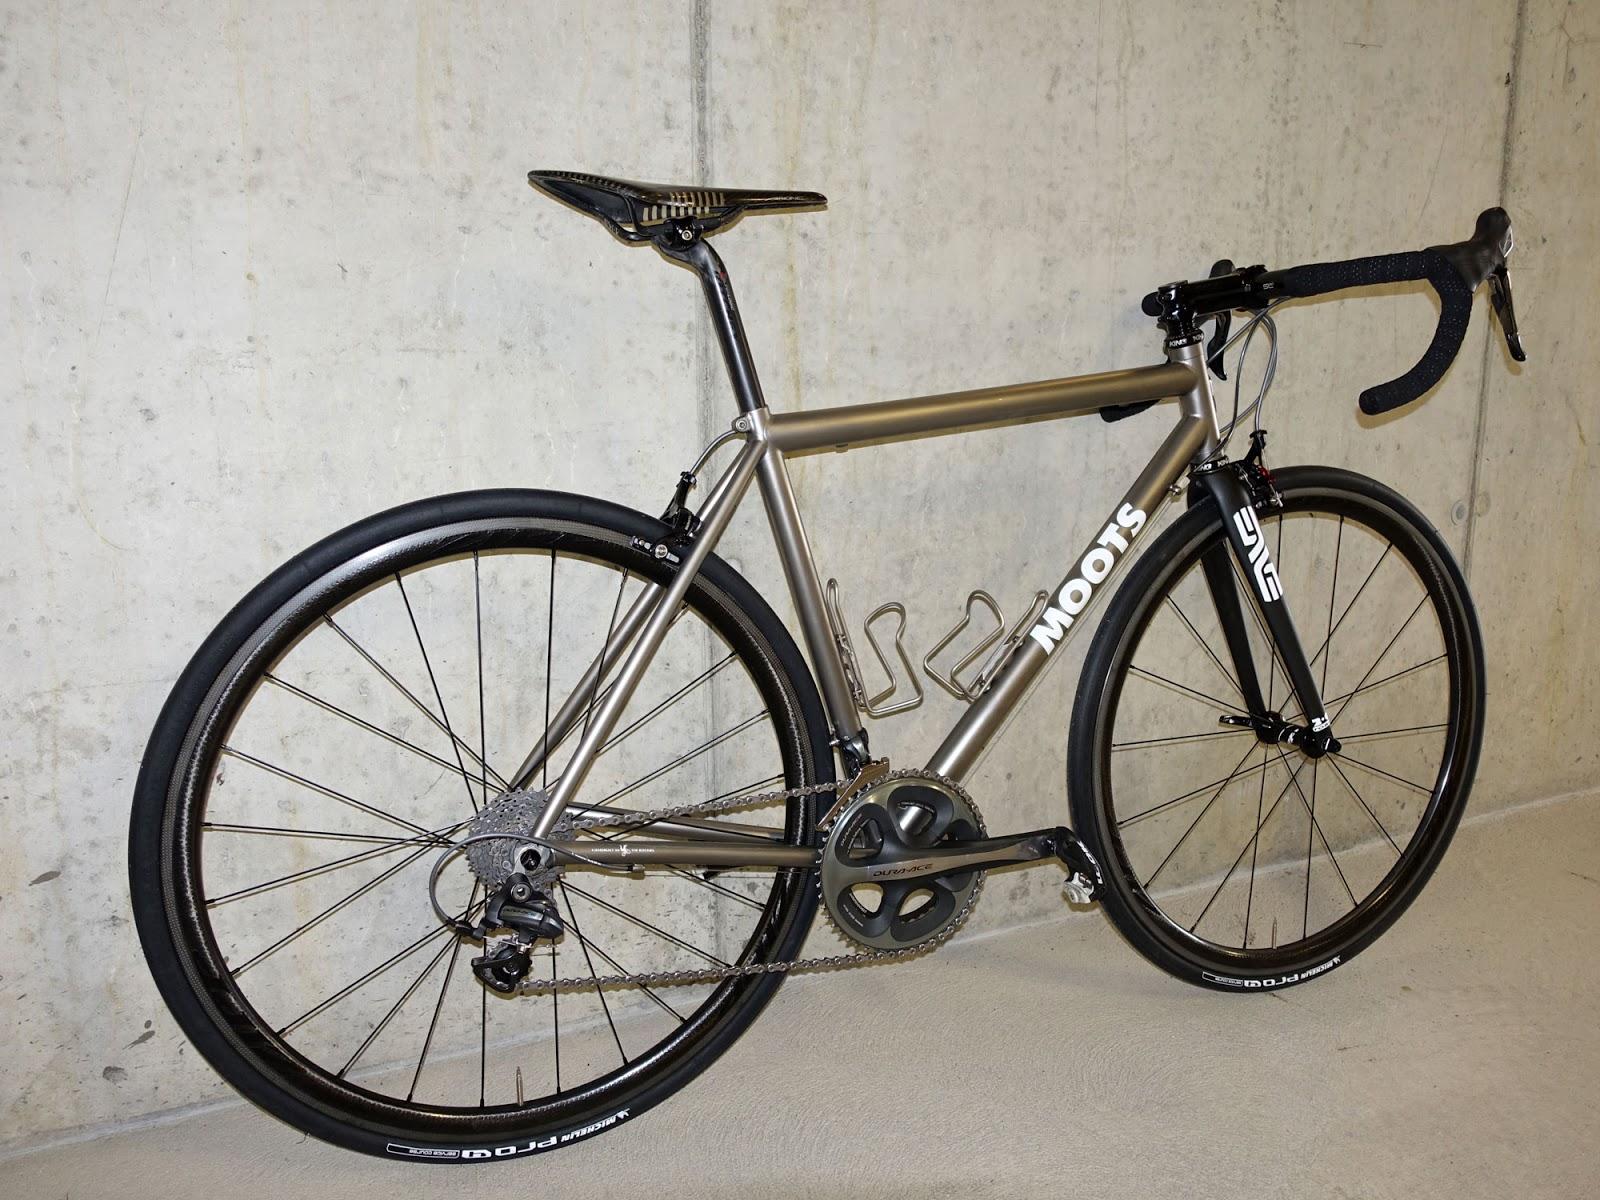 Fit for Trails Bike Blog | MTB Tests, Tipps, Stories: Fahrbericht ...